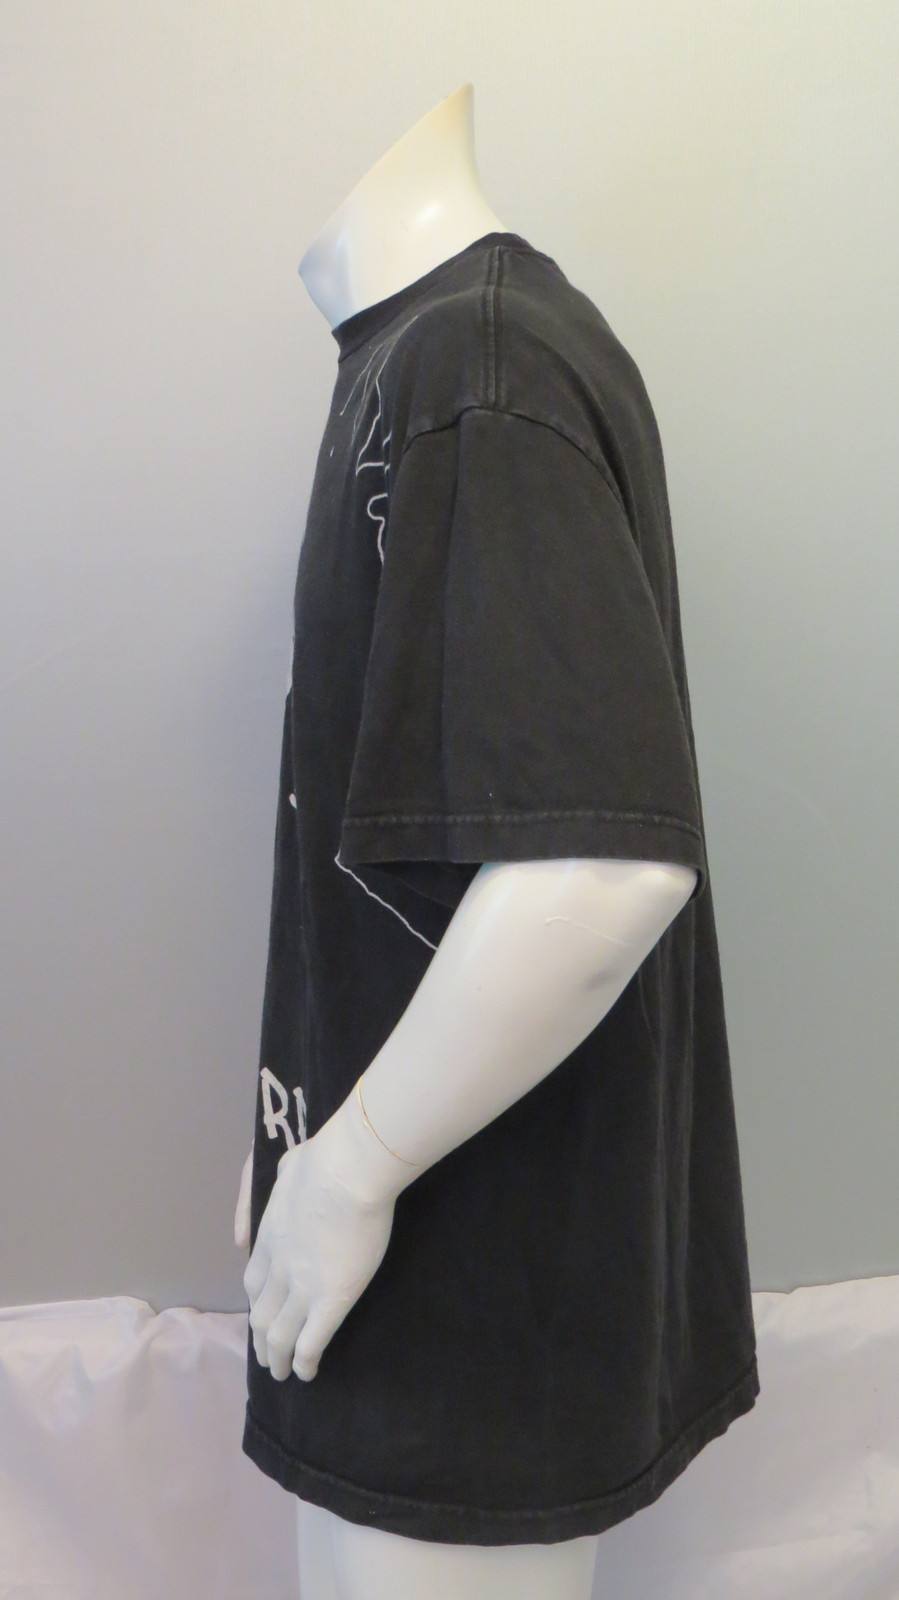 fe77be11e1 Rude Boys Snowboard Shop Shirt - Ol Dirty and 22 similar items